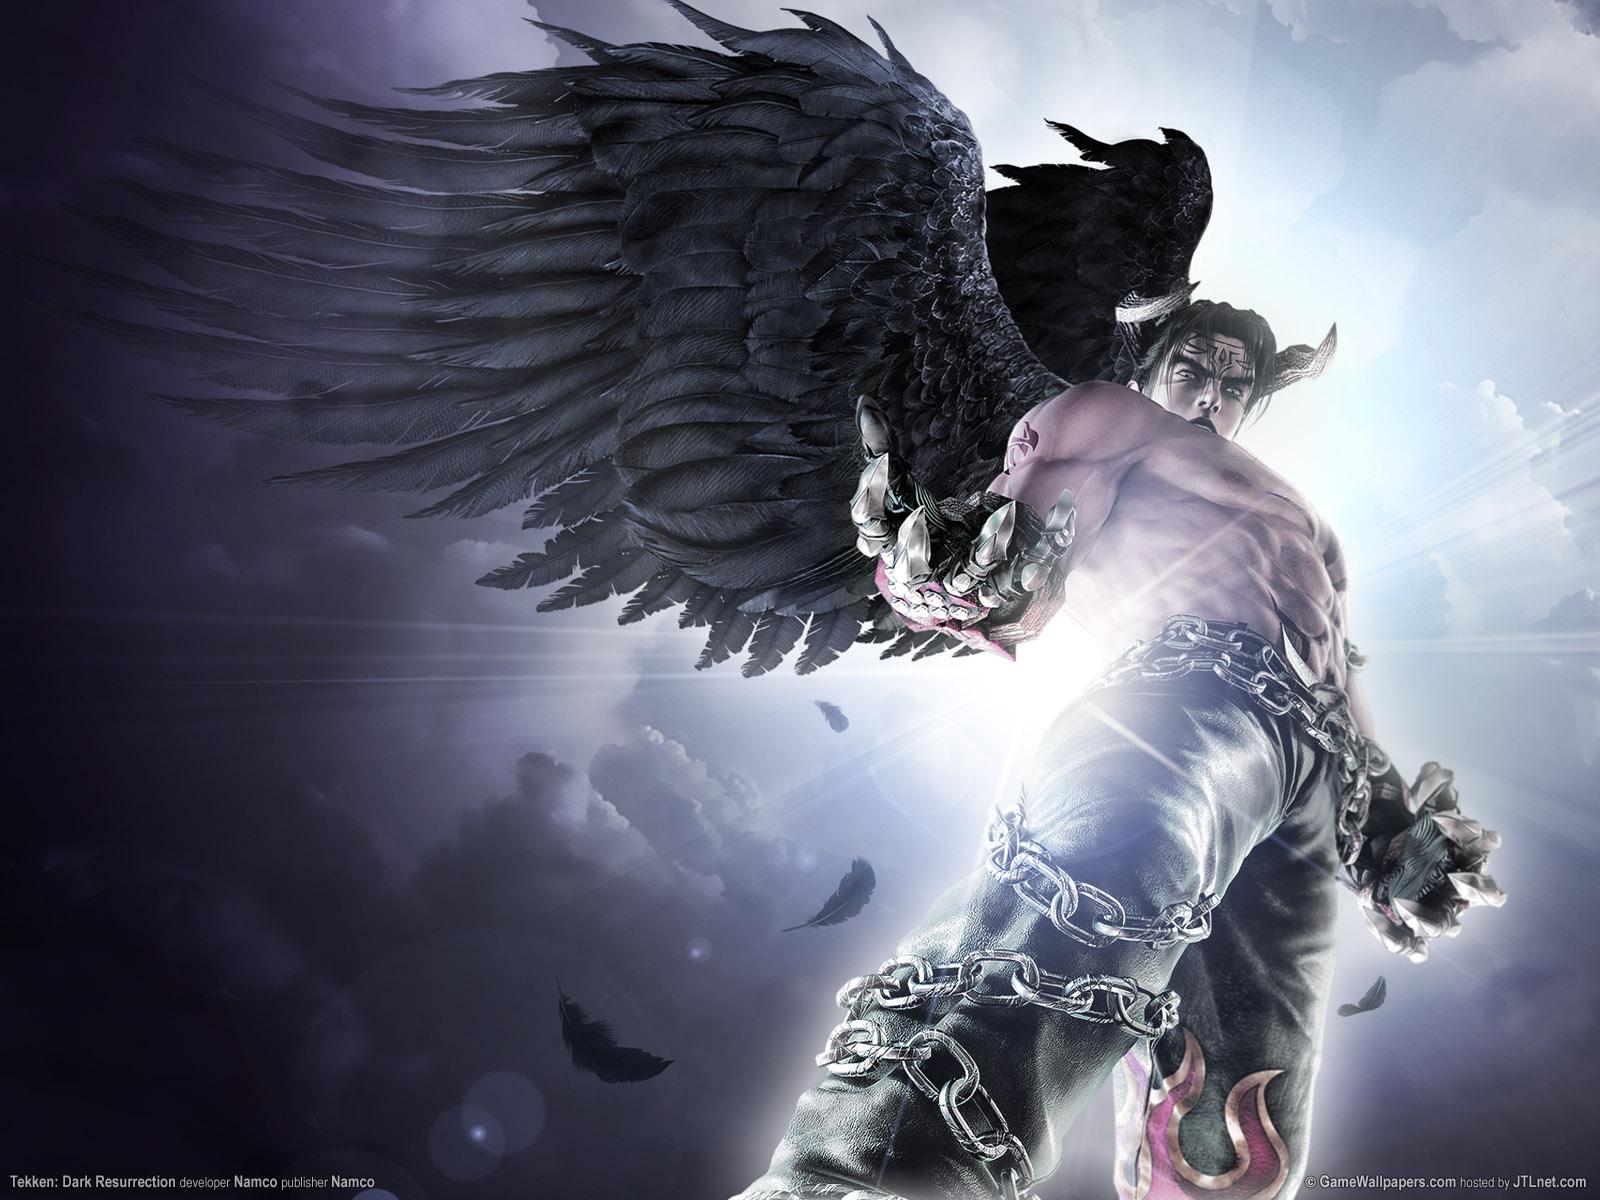 Tekken 7 Wallpaper – 1600 x 1200 pixels – 319 kB